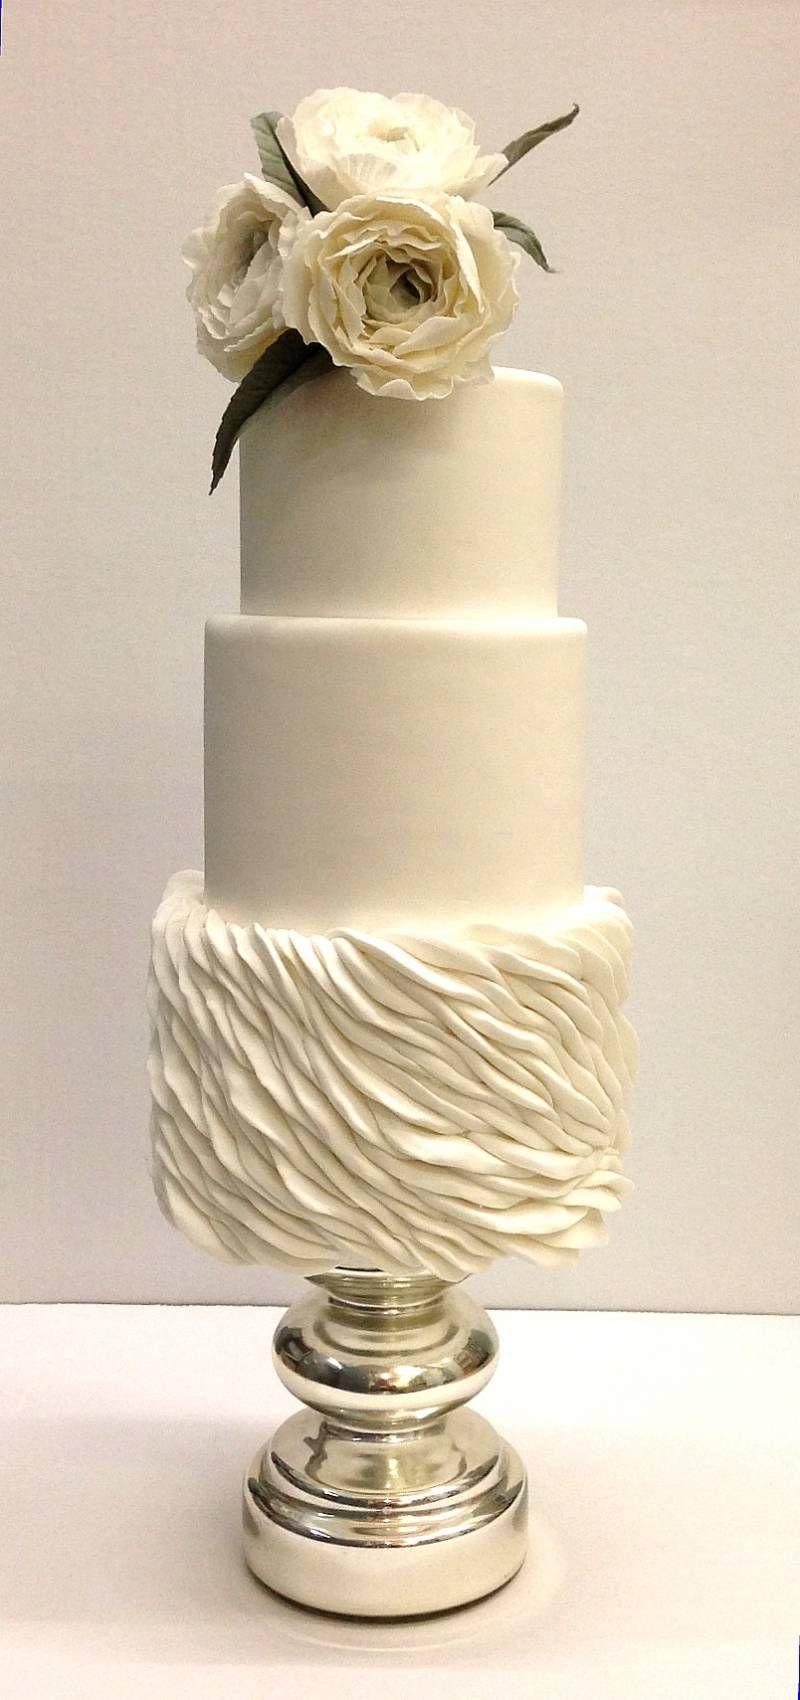 Artistic wedding cakes by jasmine rae cakes san